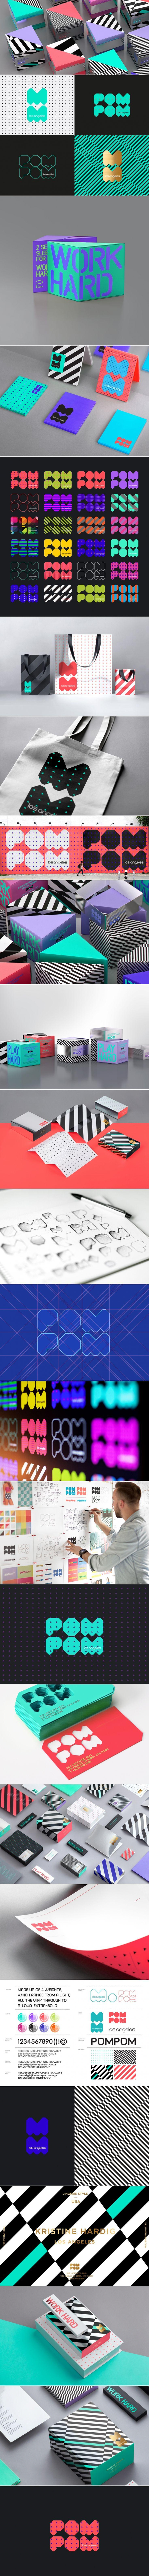 POM POM — The Dieline   Packaging & Branding Design & Innovation News